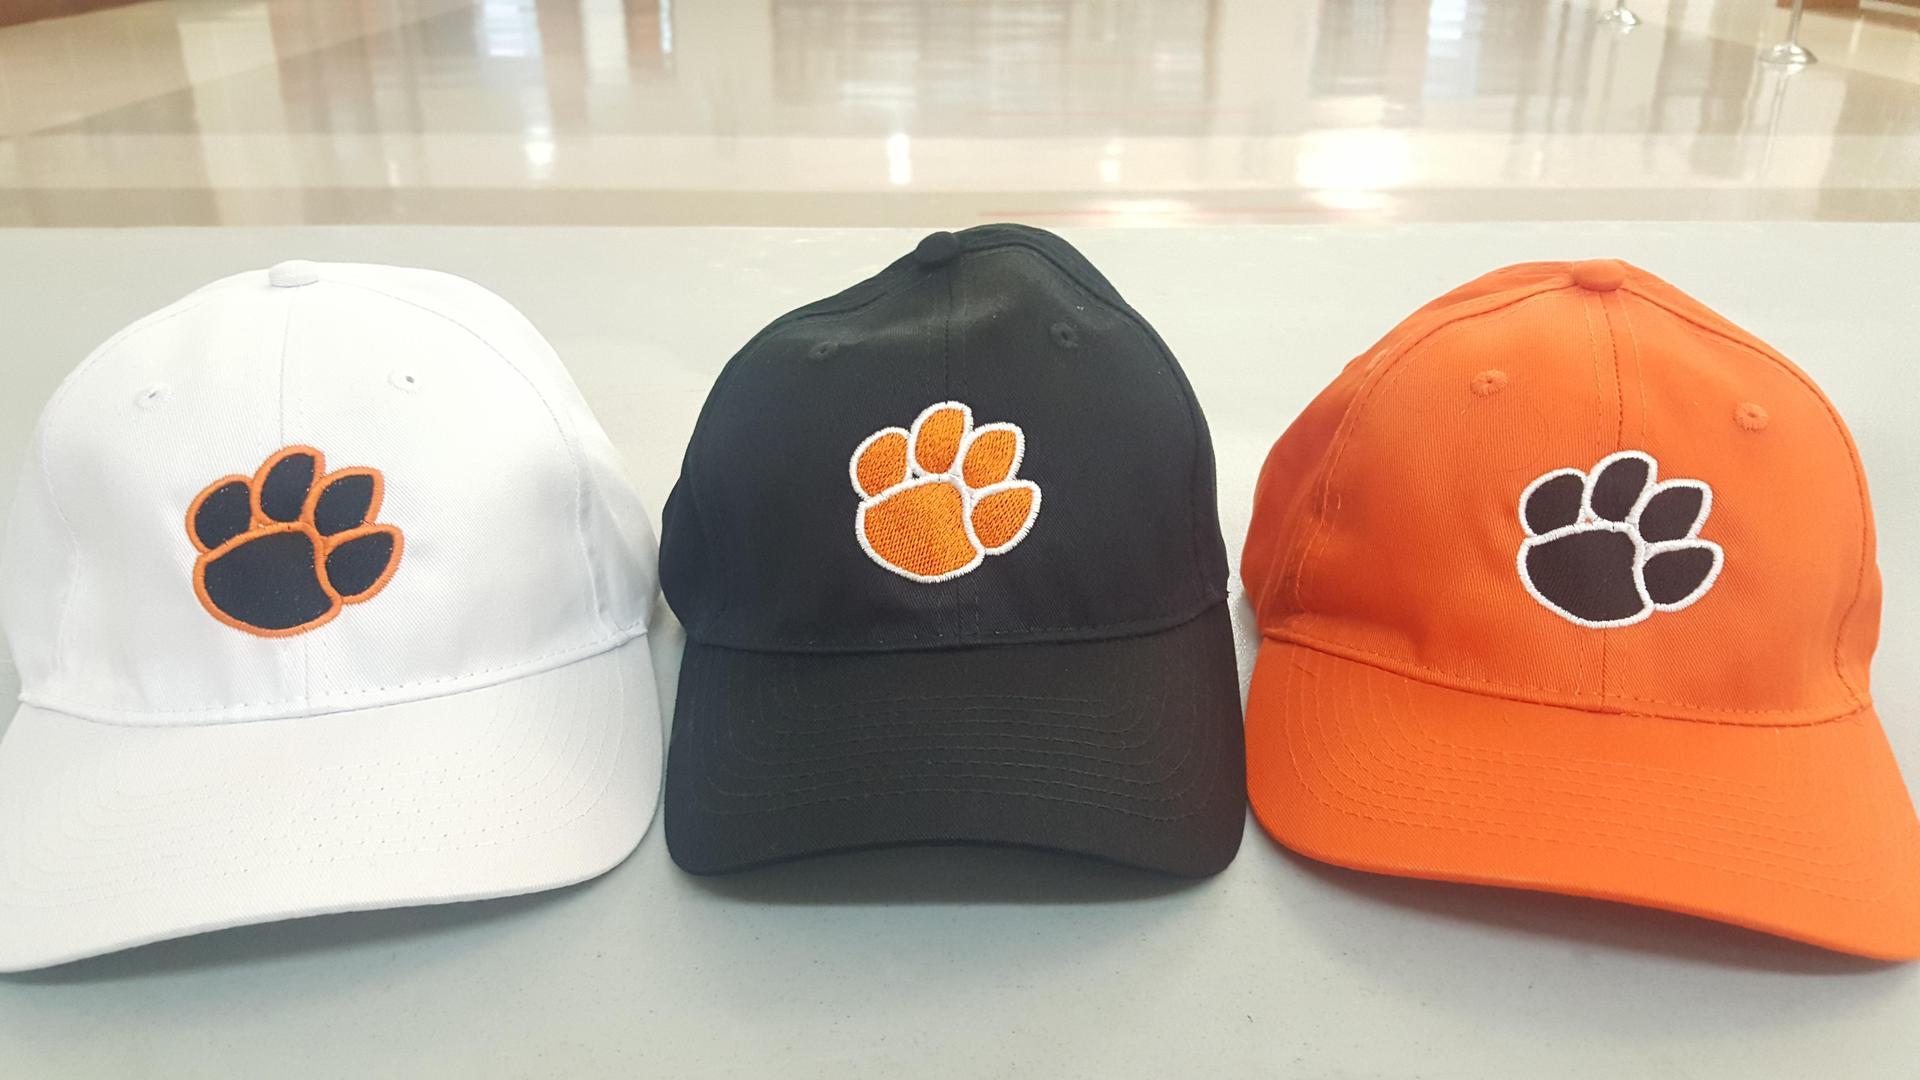 Tiger paw cap Orange black white 15.00 One size